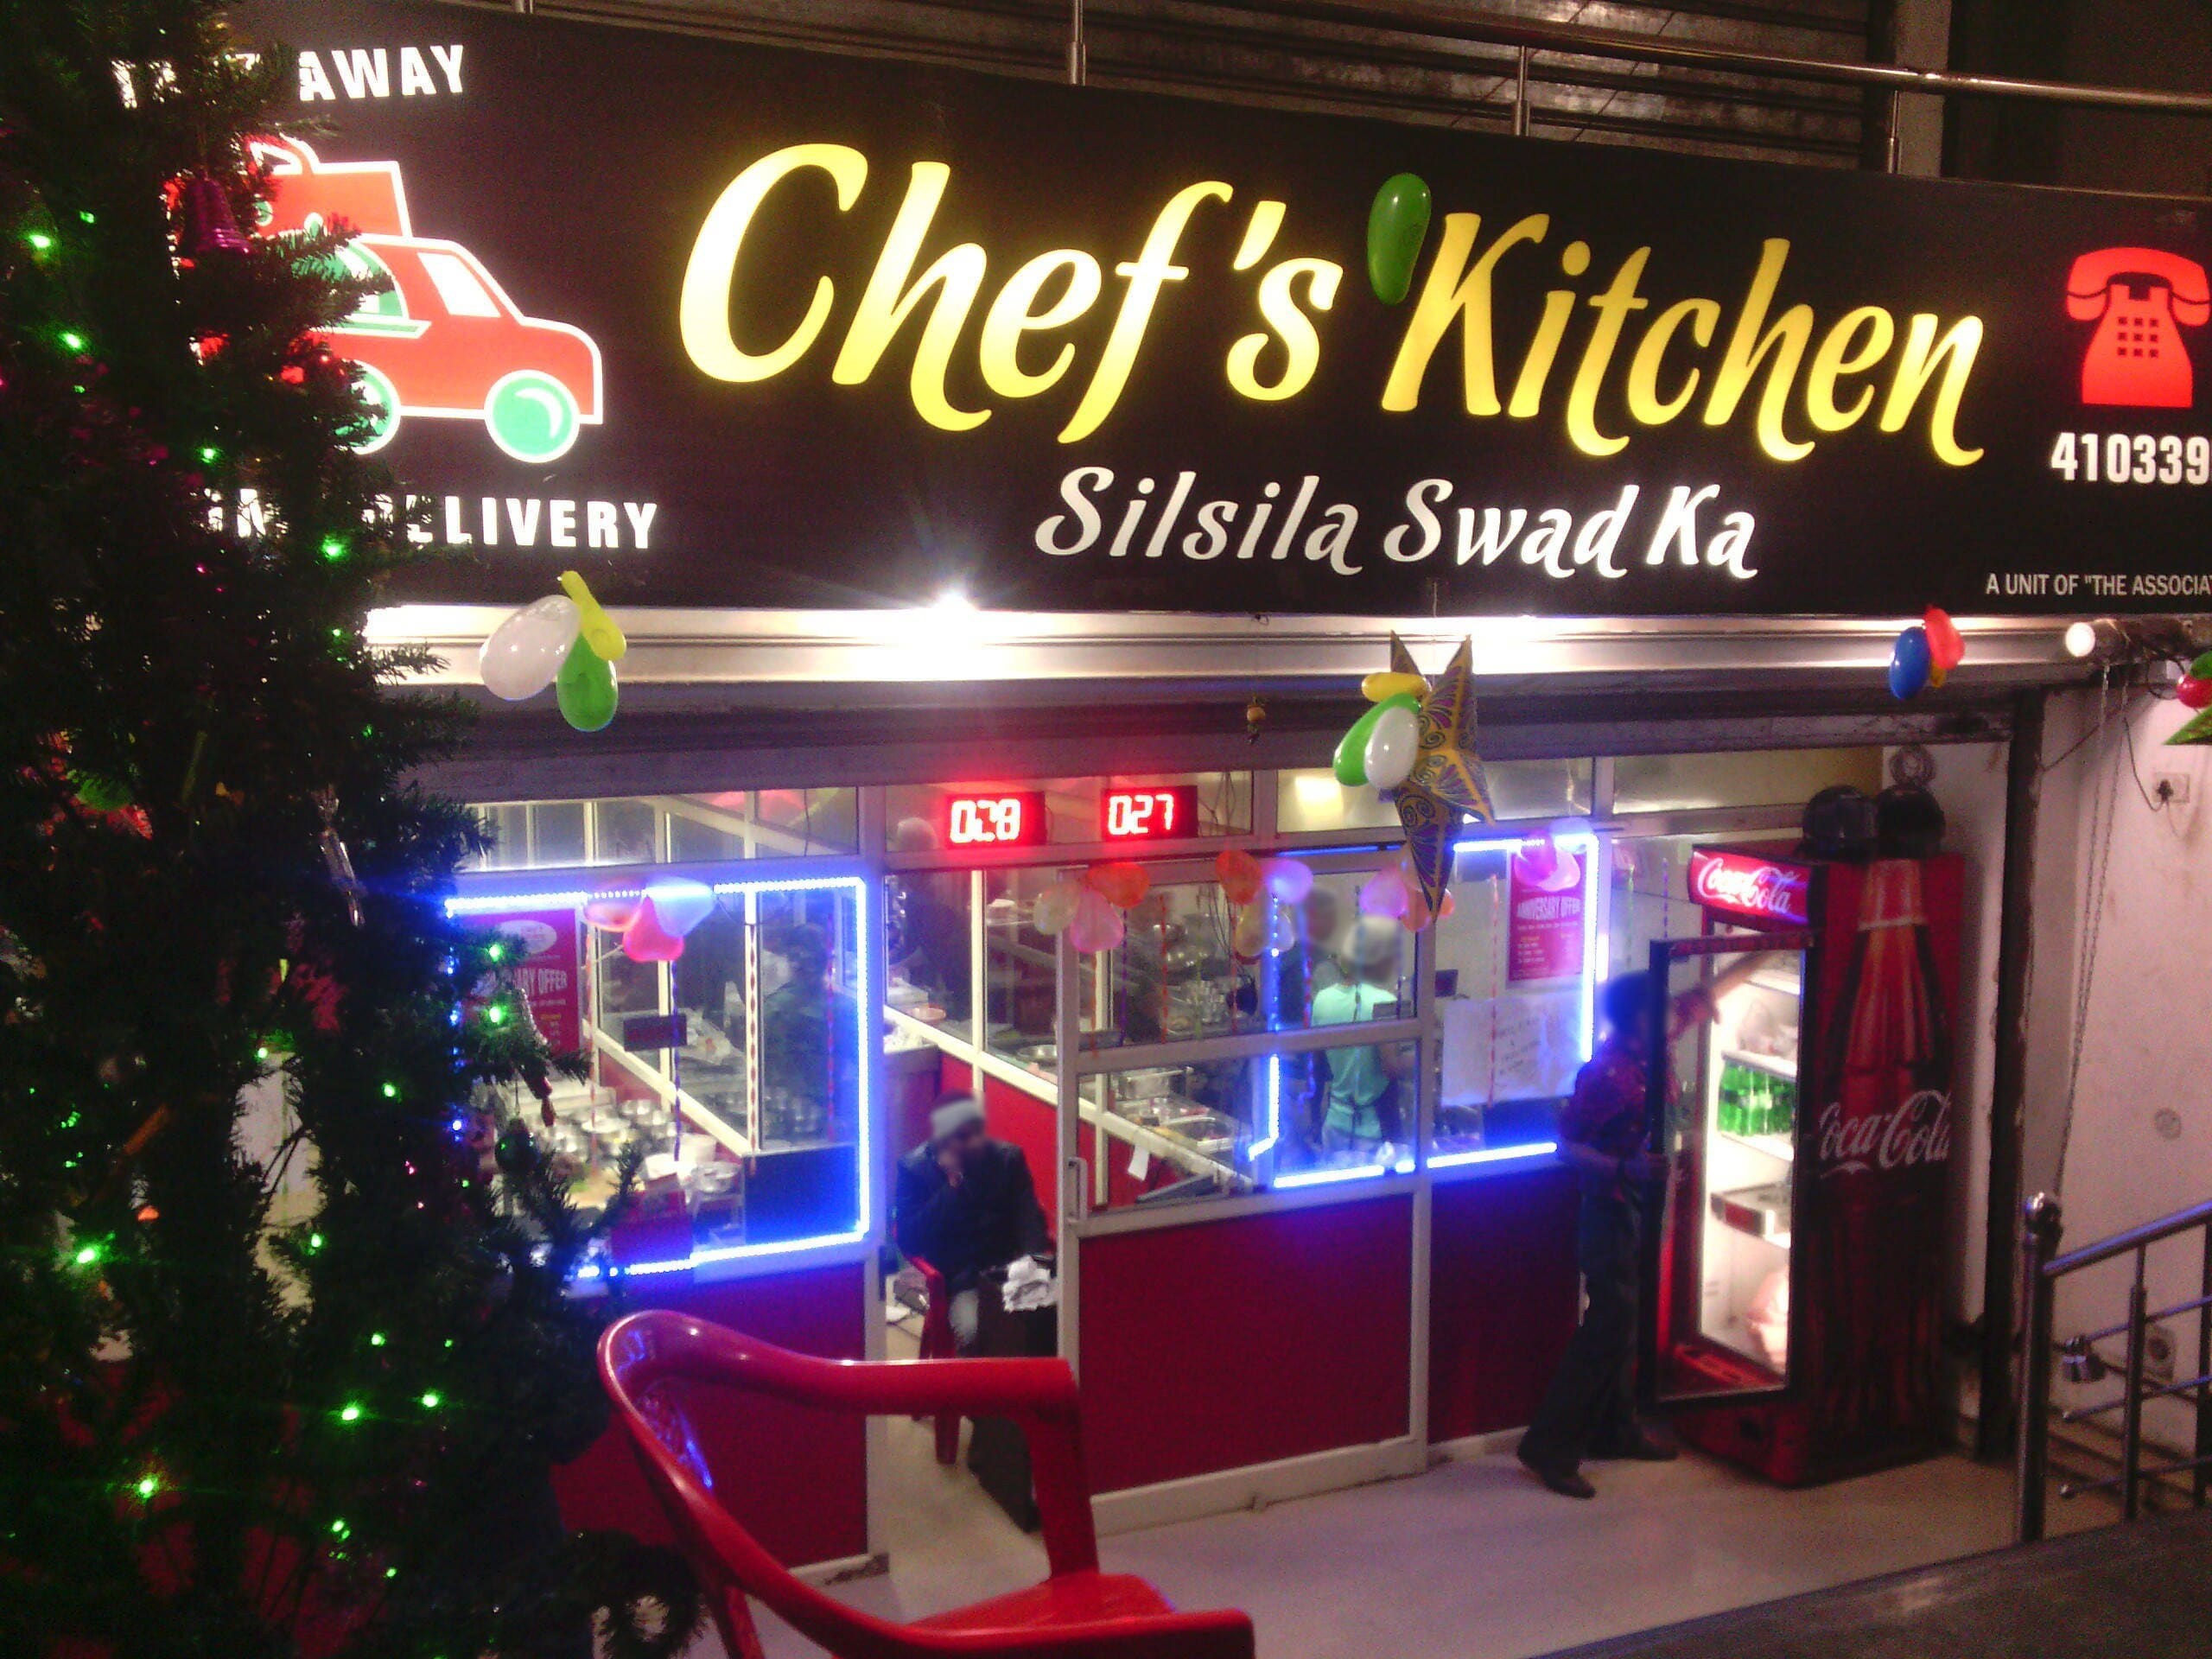 Chef's Kitchen - Aashiana - Lucknow Image